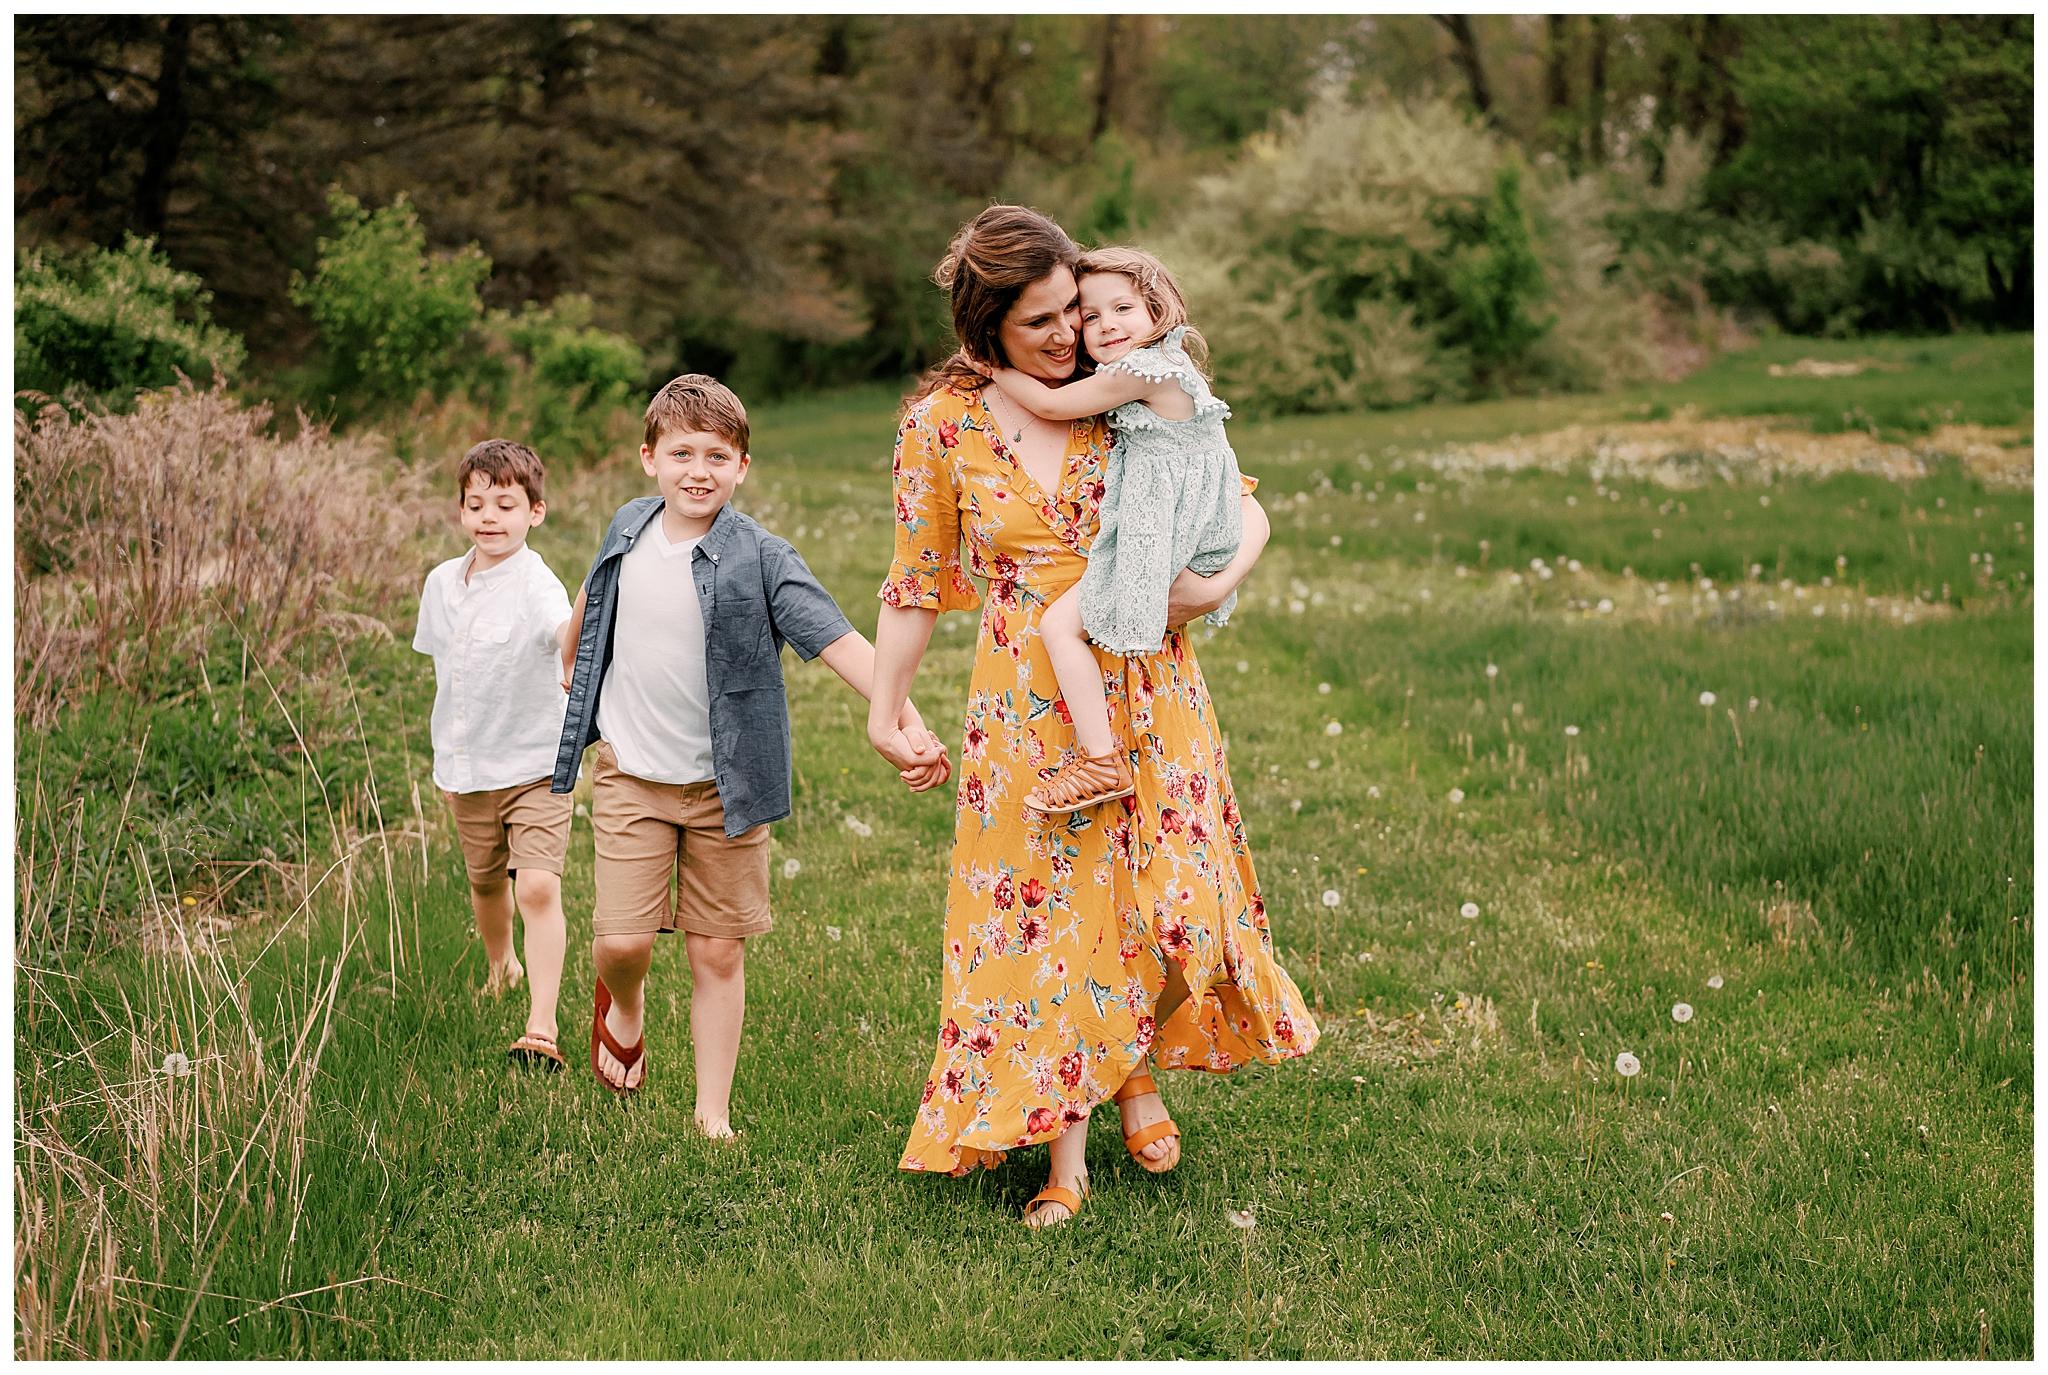 AnneMarie_Hamant_family_photographer_lehigh_valley_pa_0266.jpg